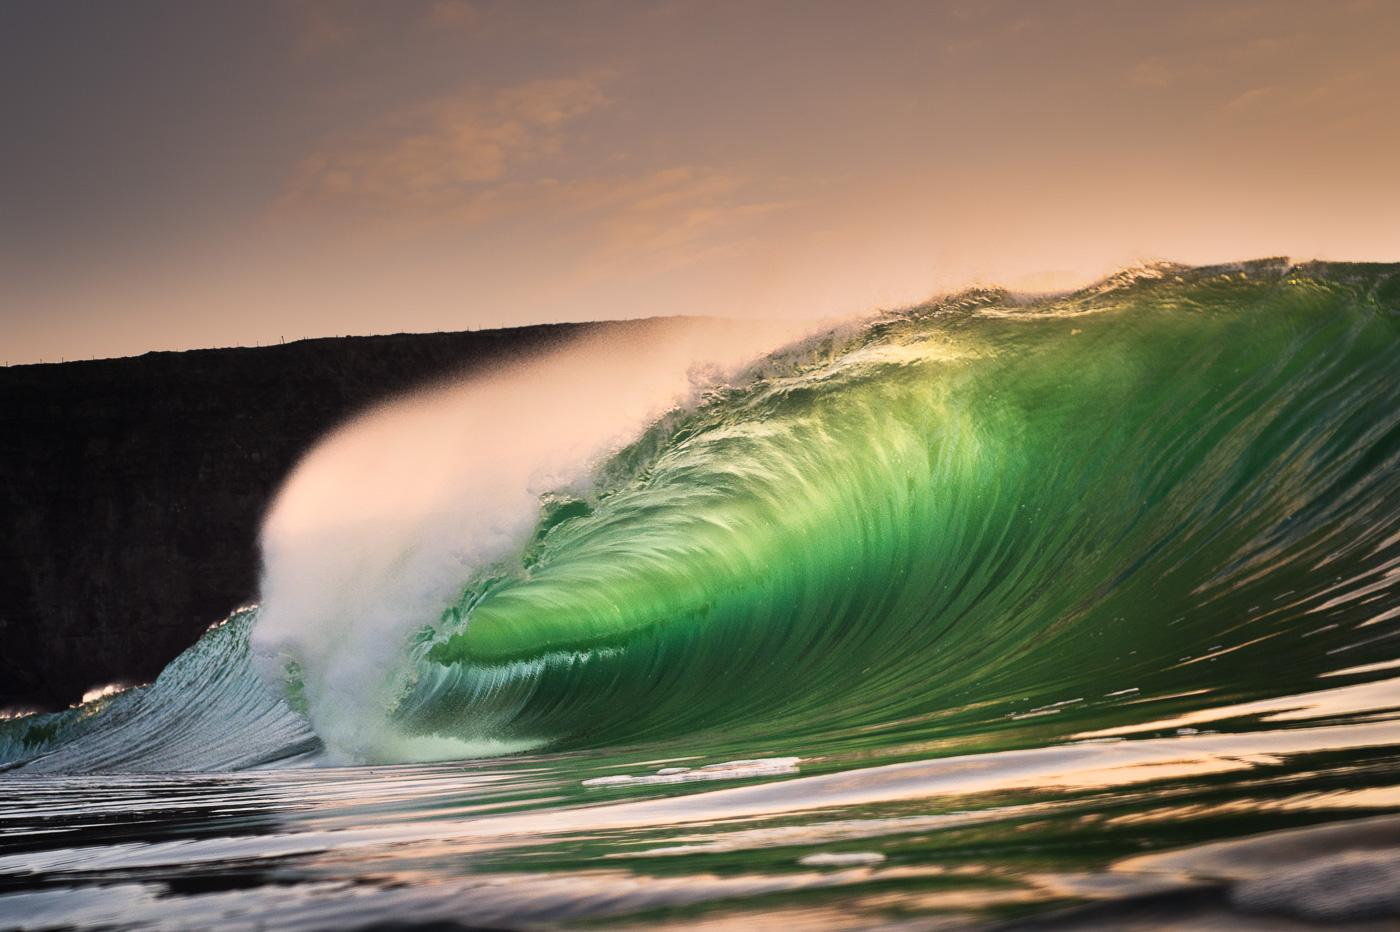 beautiful lit barreling wave ireland riley's